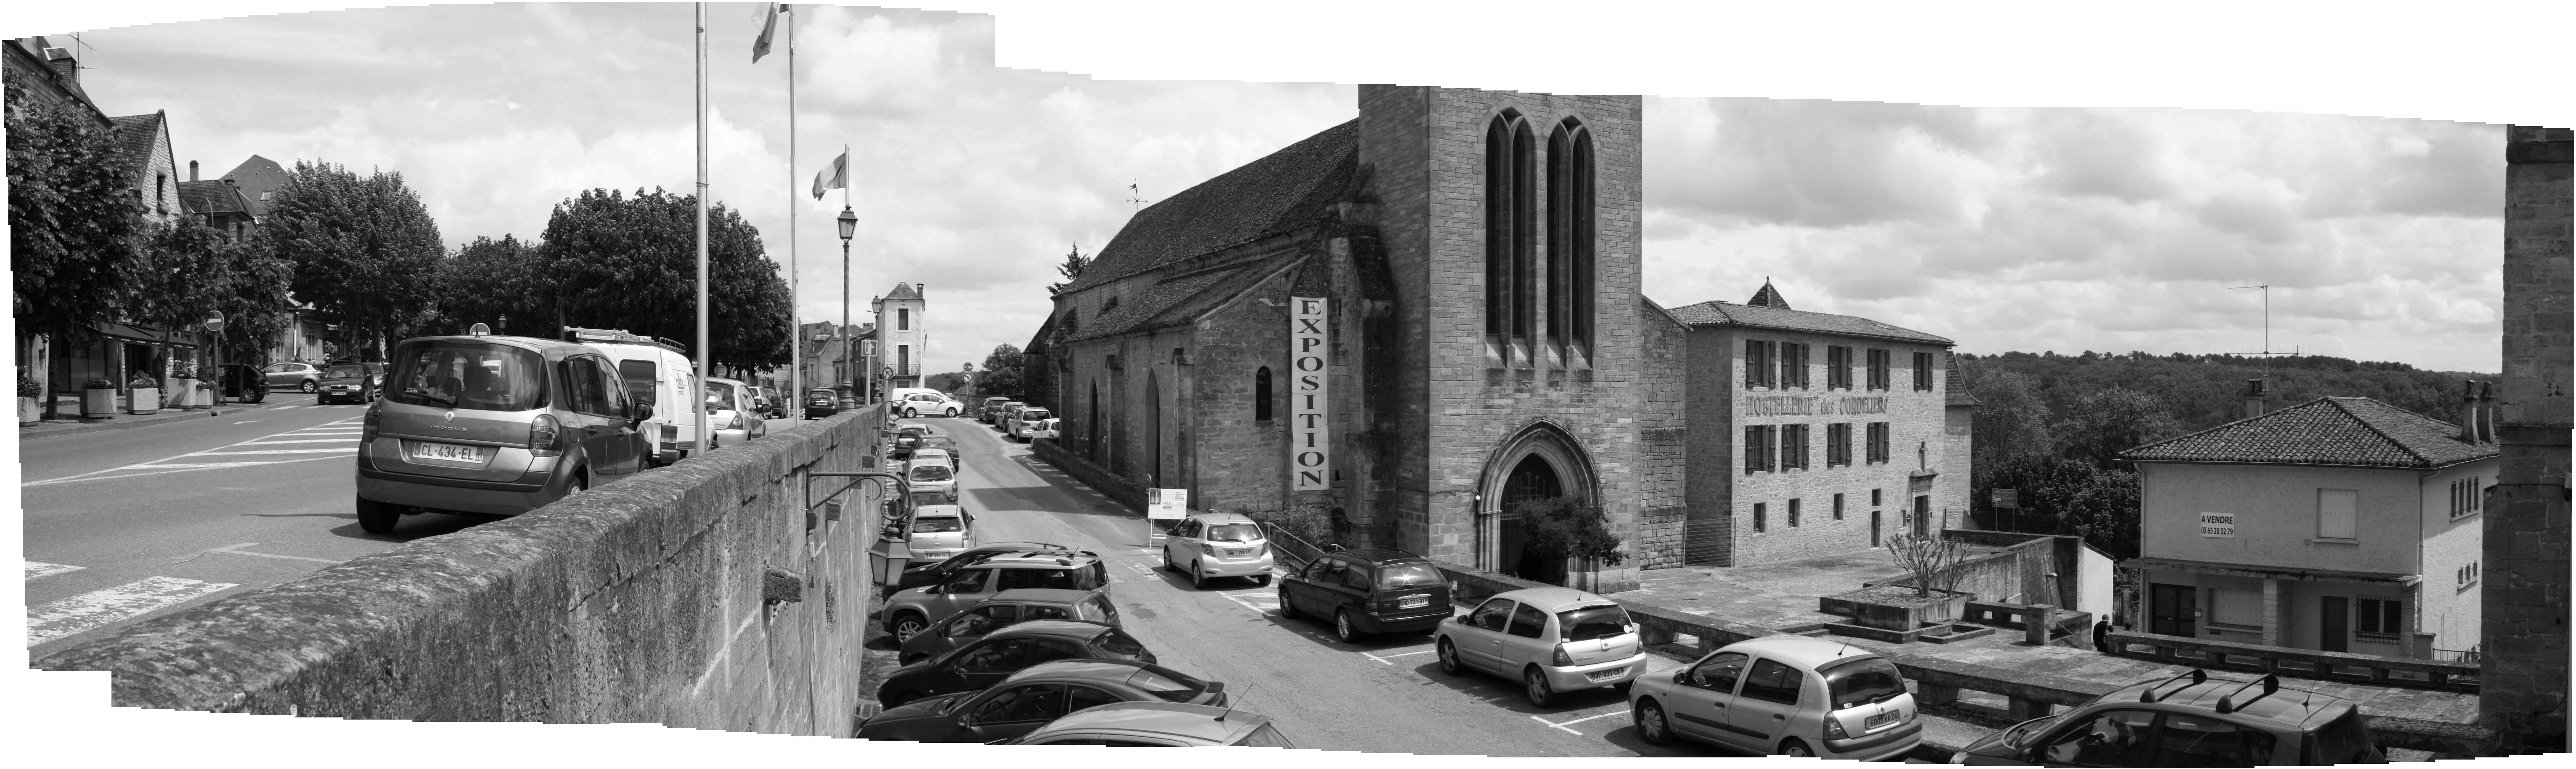 Panorama sans titre6.jpg